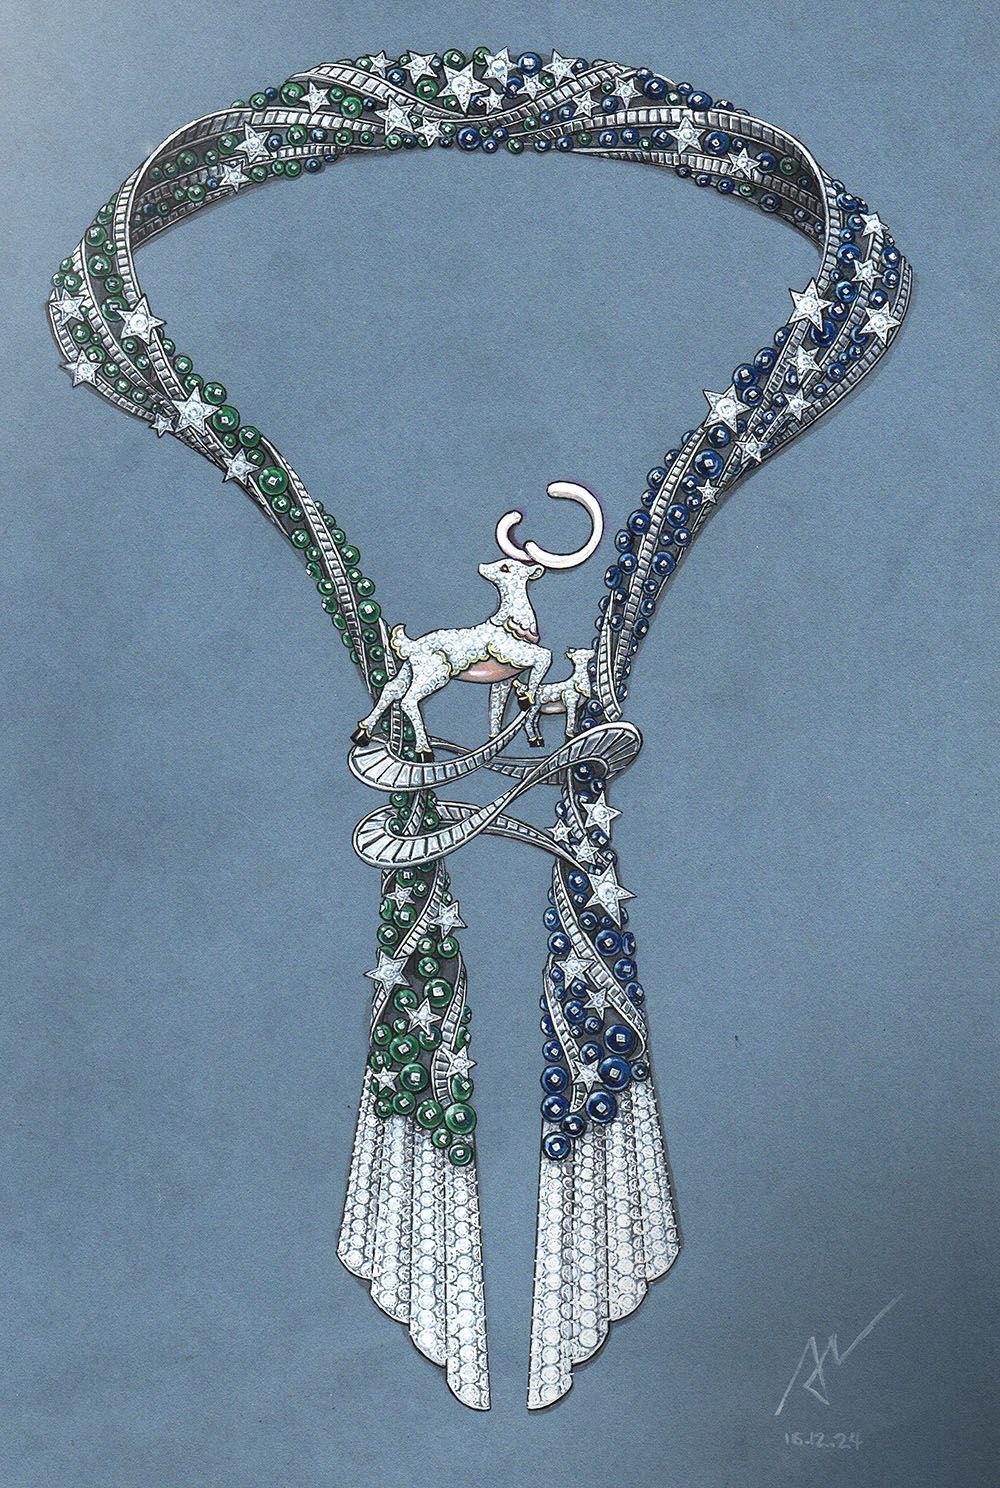 Azilaz necklace handdrawing handsketch jewelry designer